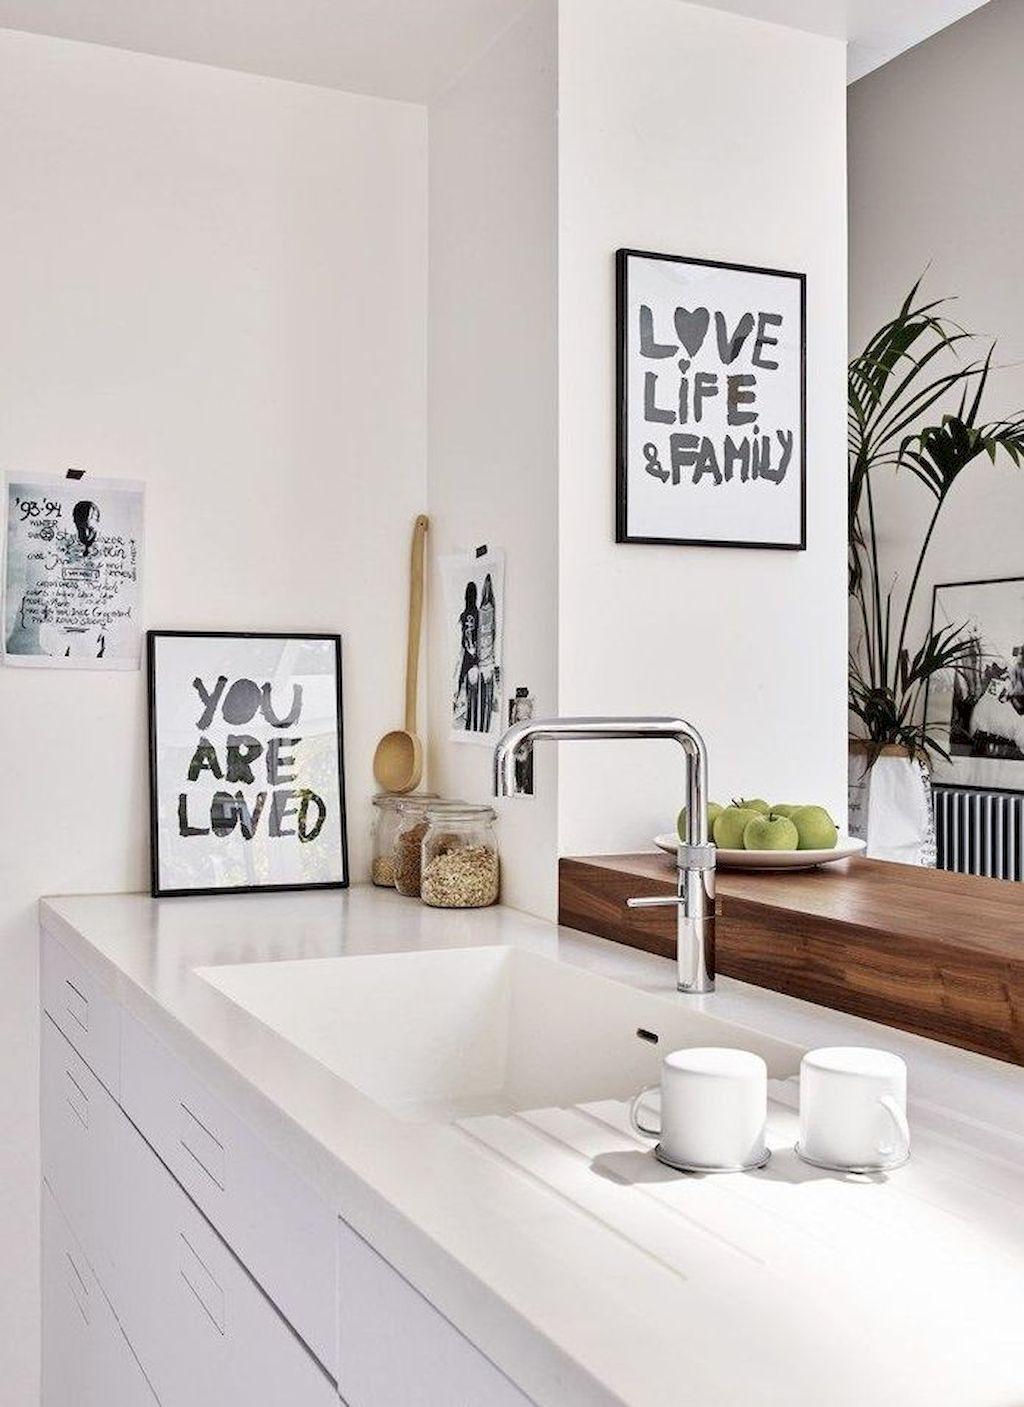 29 Gorgeous White Kitchen Cabinet Design Ideas (With ...